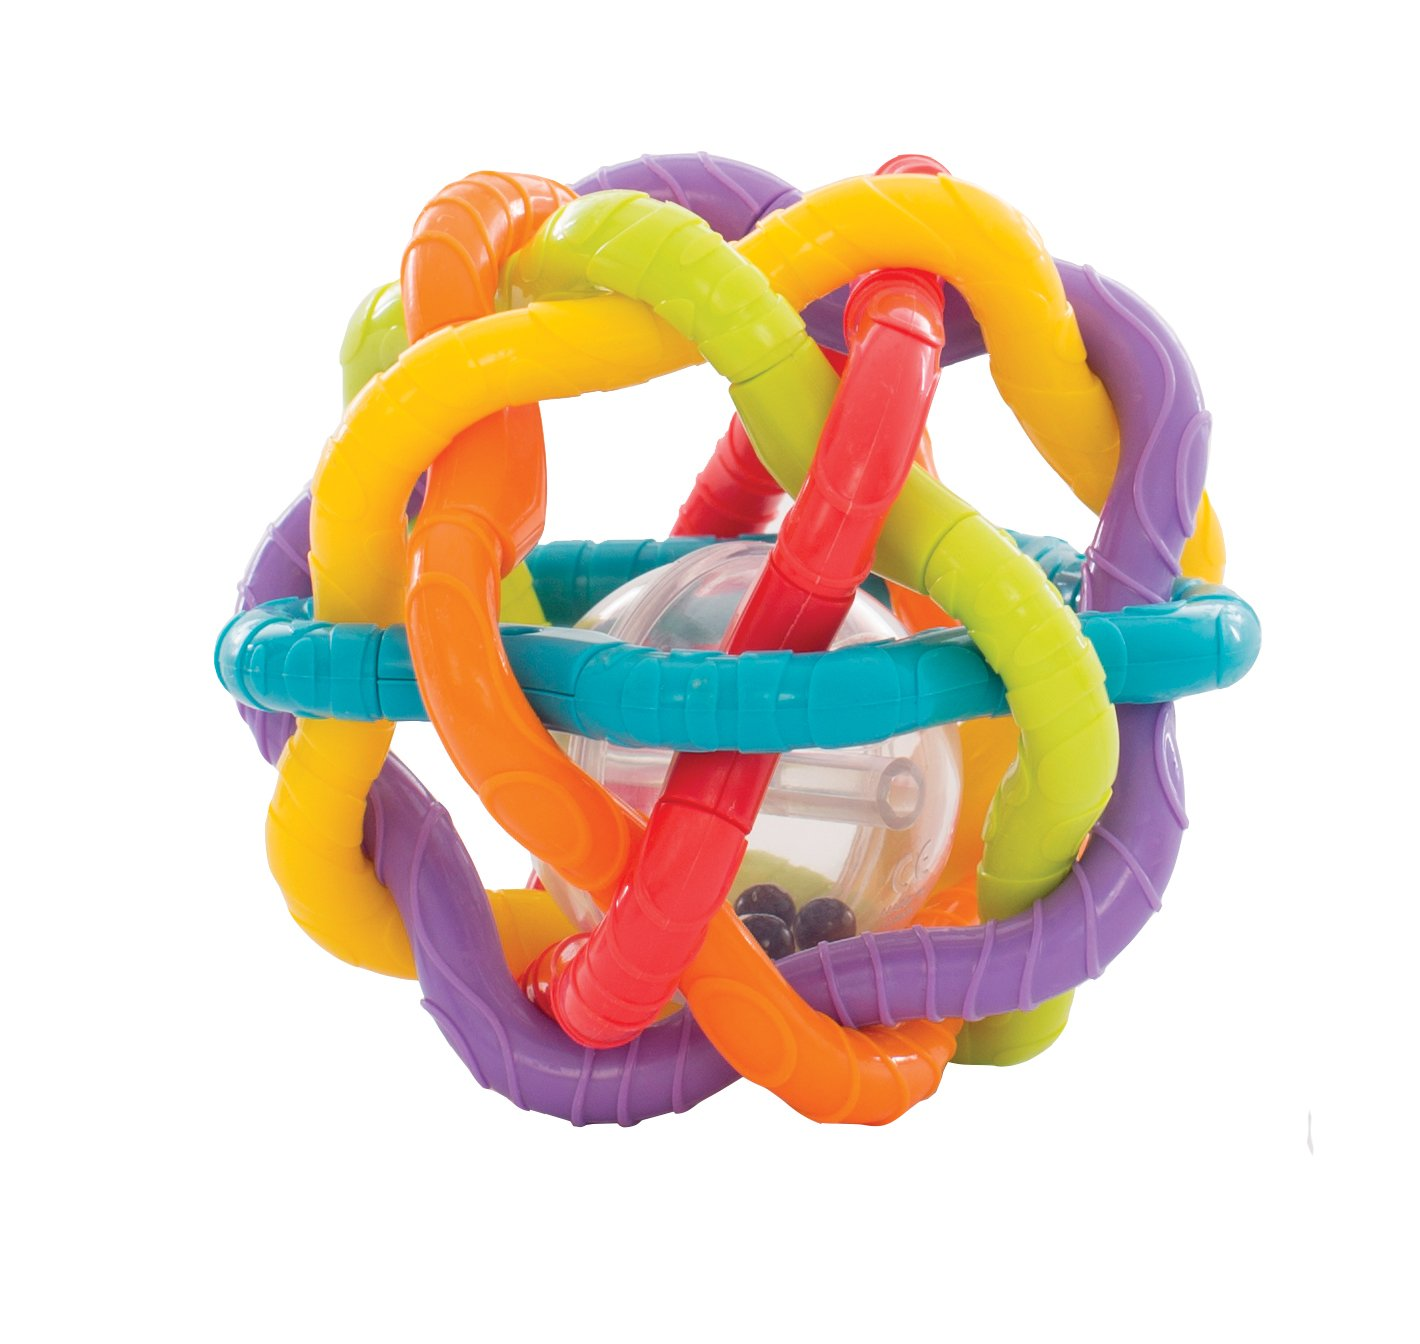 Playgro 40133Rattle/Bendy Ball, Multi-Colour 0184557